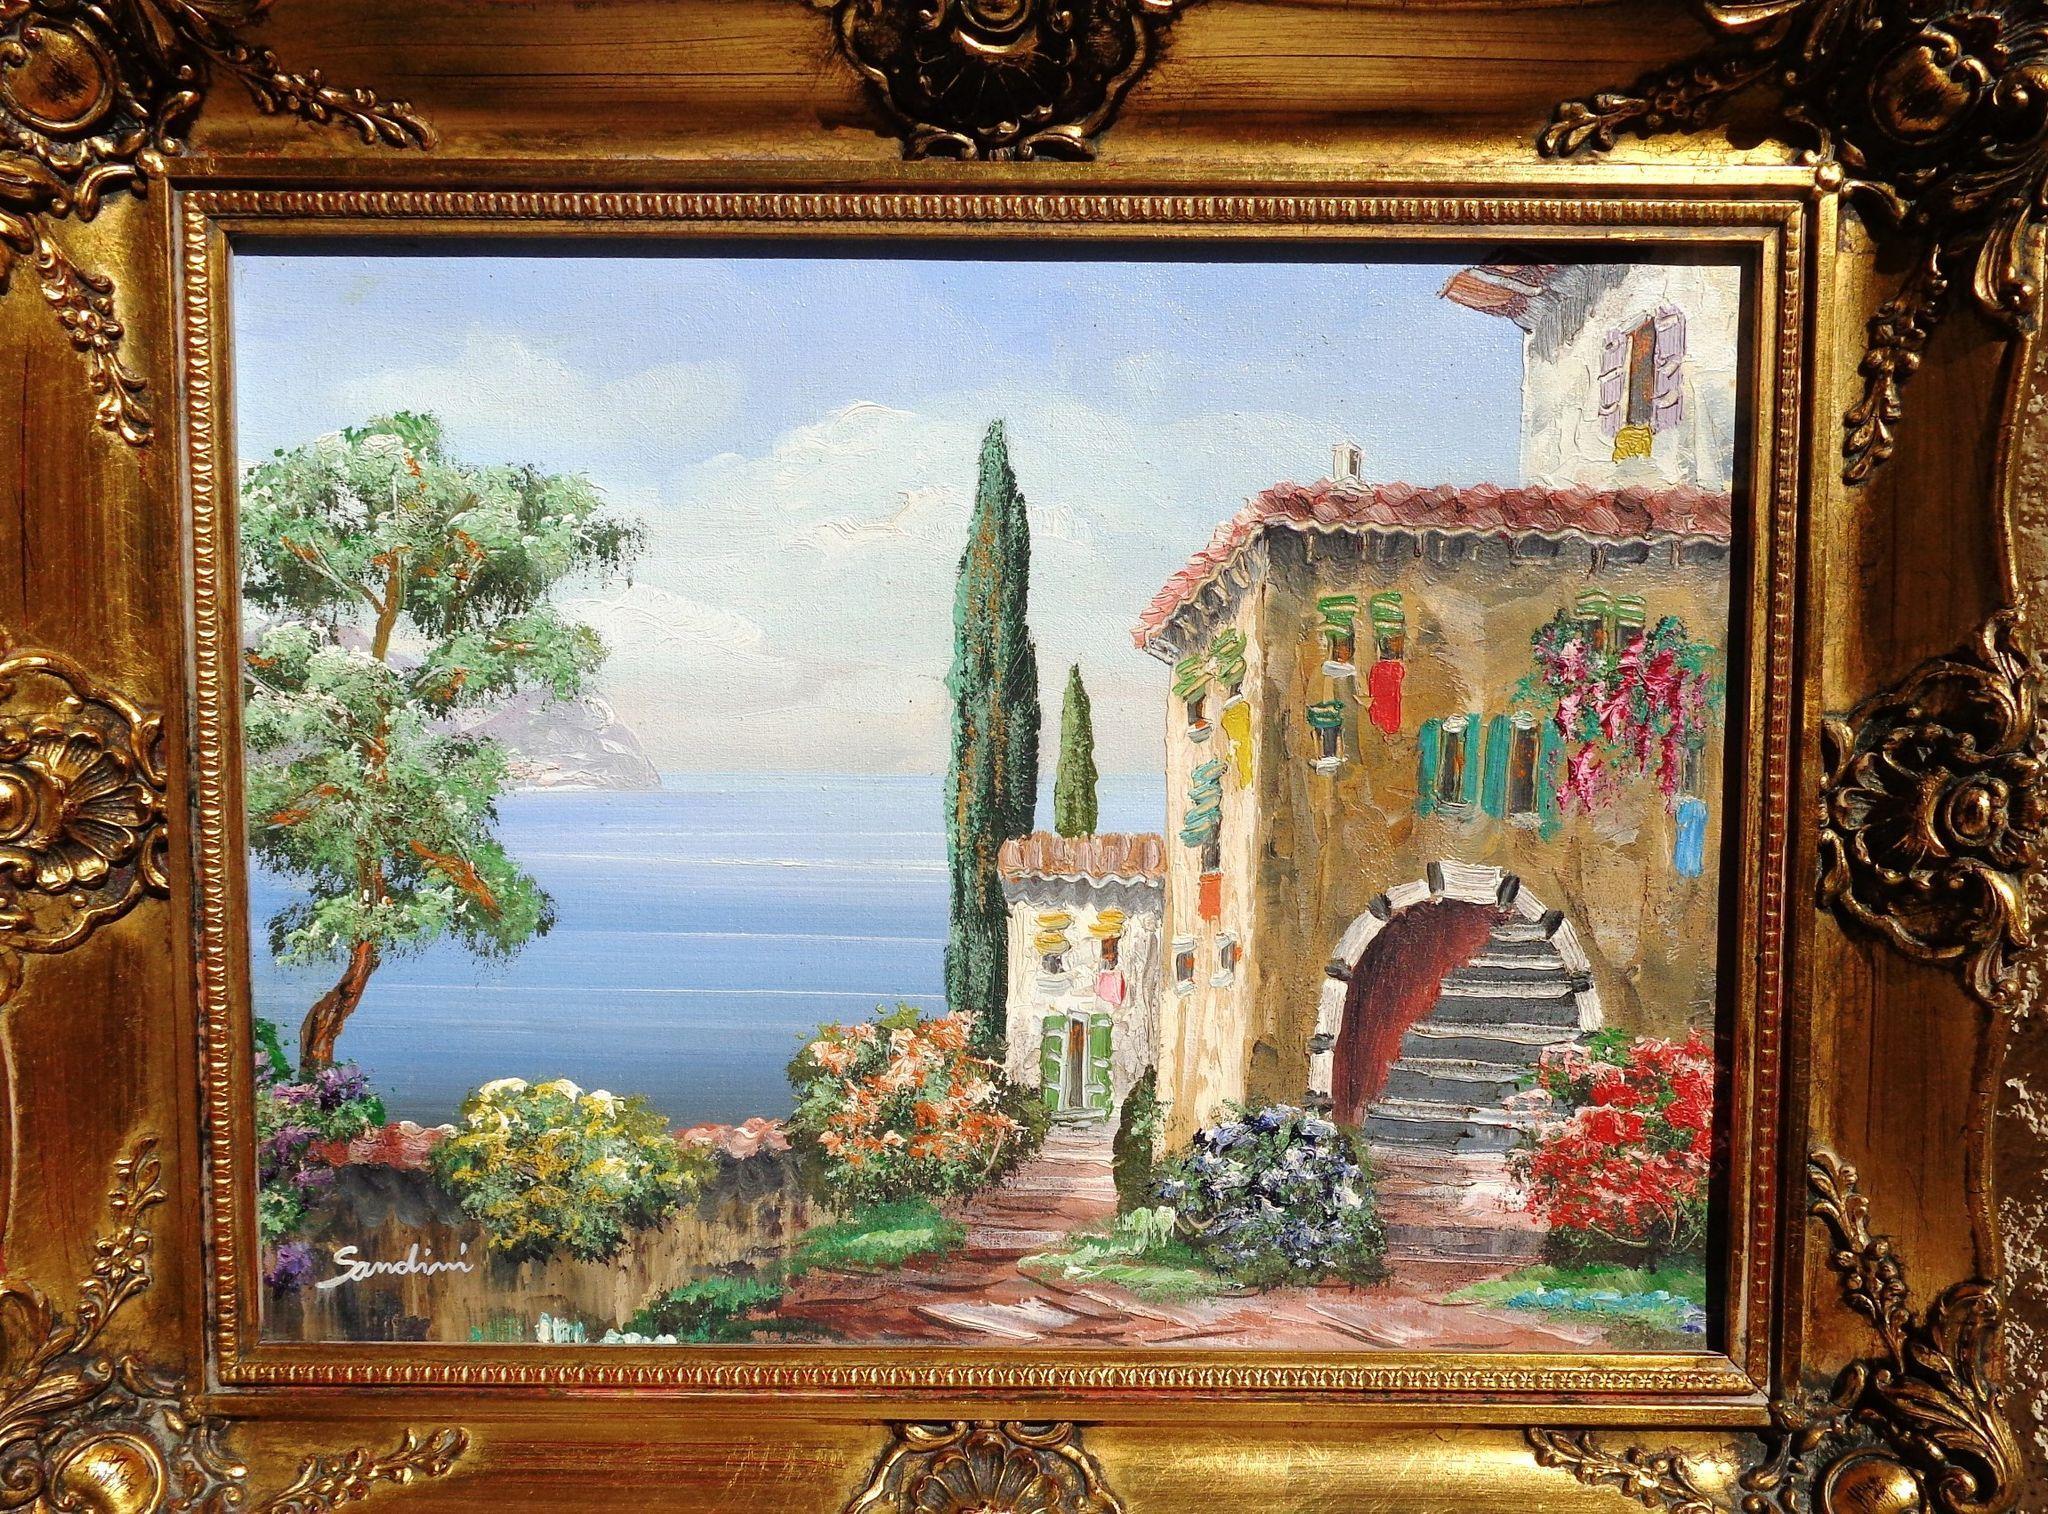 Rare Italian Landscape Oil Painting by Luigi Sandini